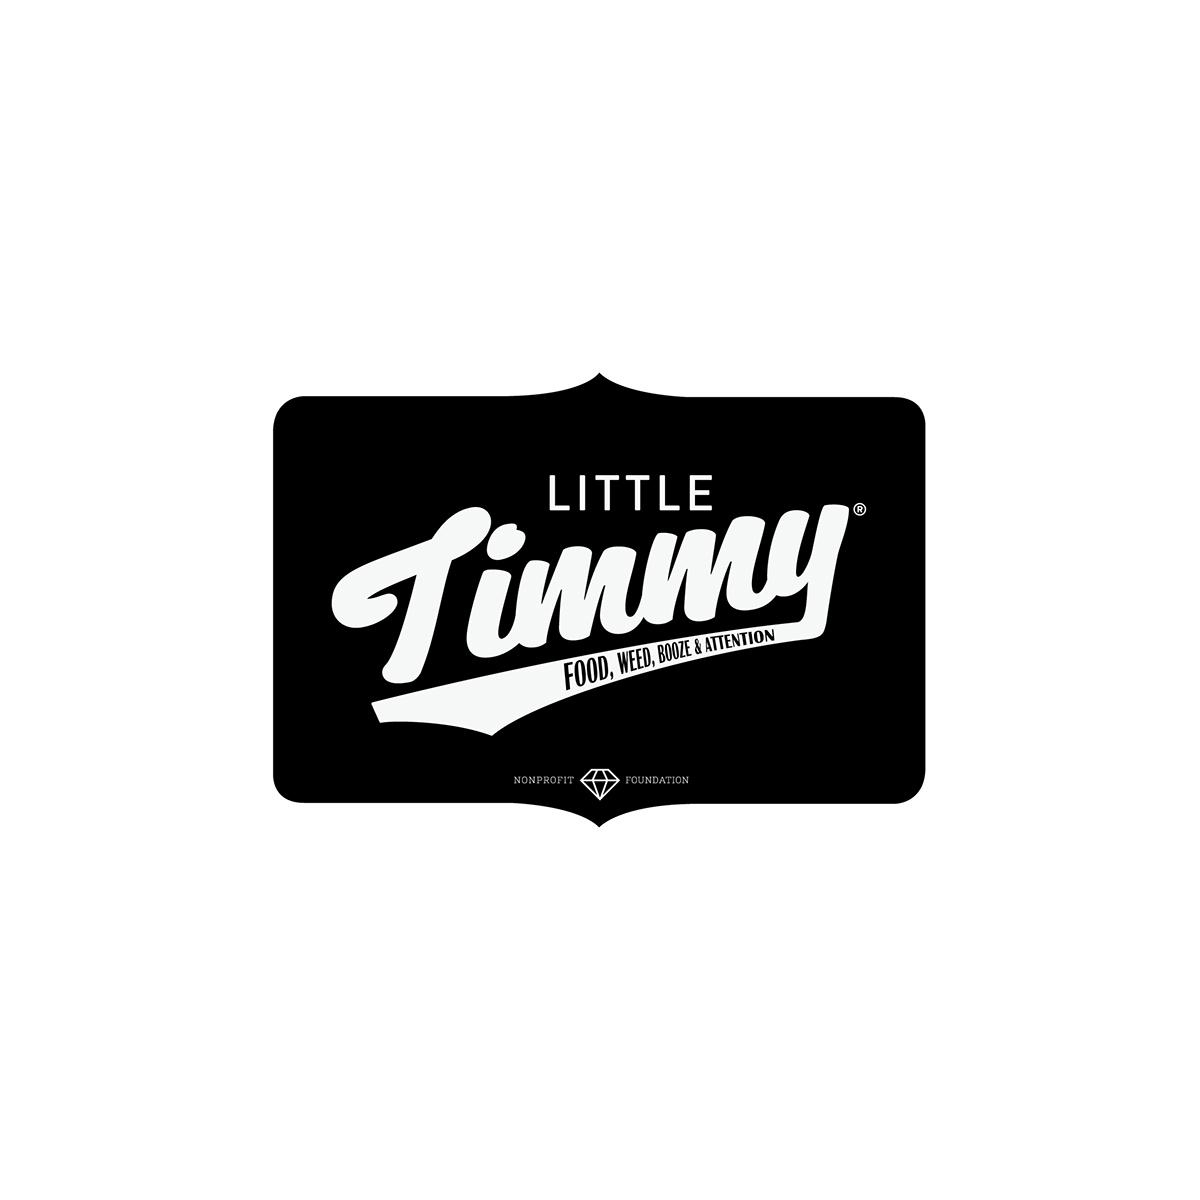 logos  stupid logos stupid design